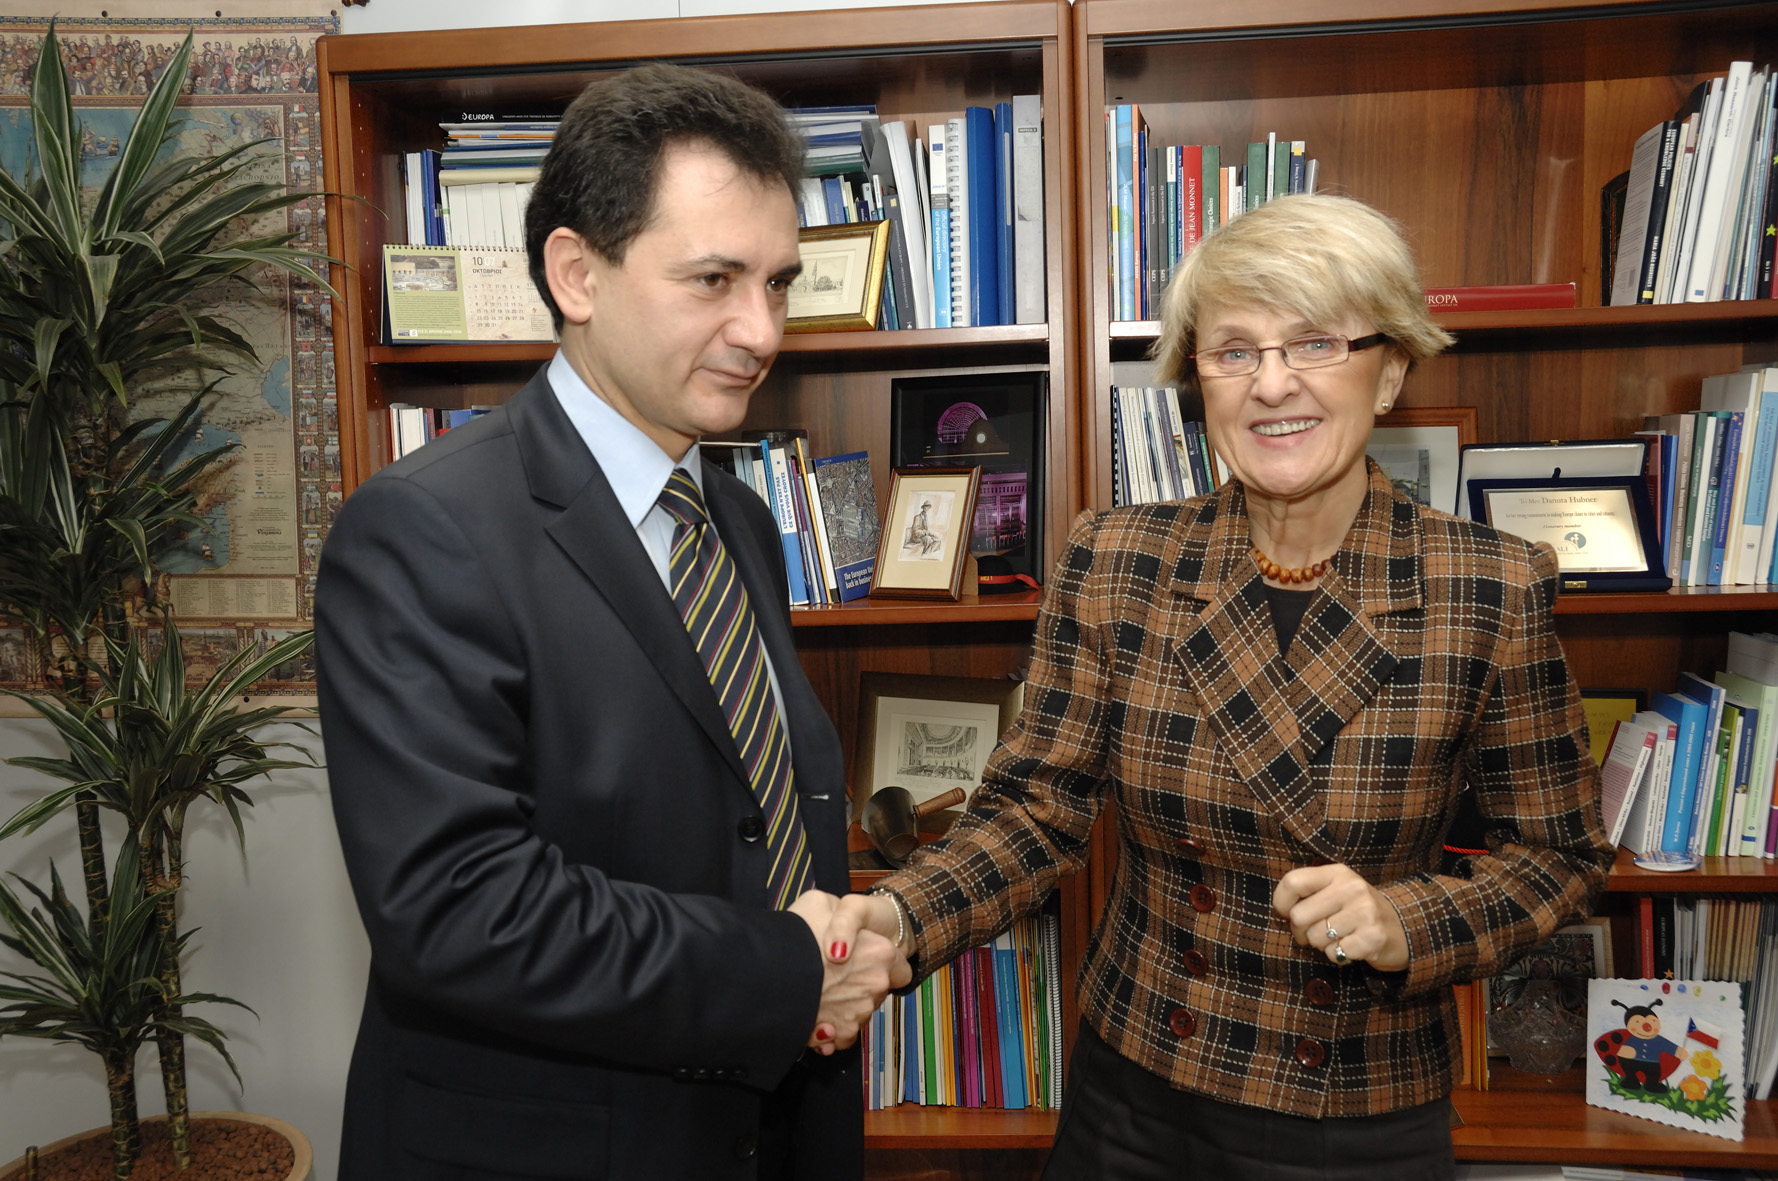 Visit by Bozidar Djelic, Serbian Deputy Prime Minister, to the EC